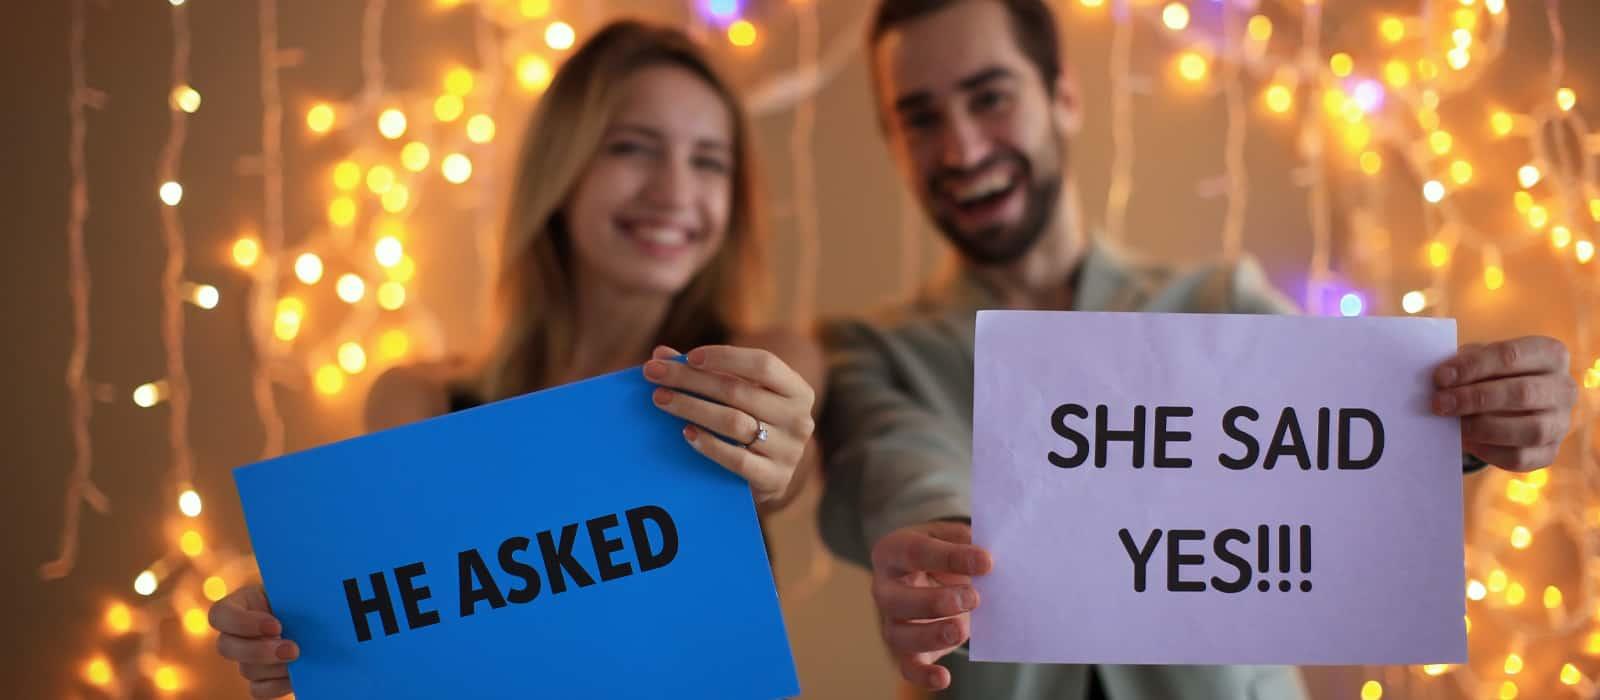 ella dijo SI